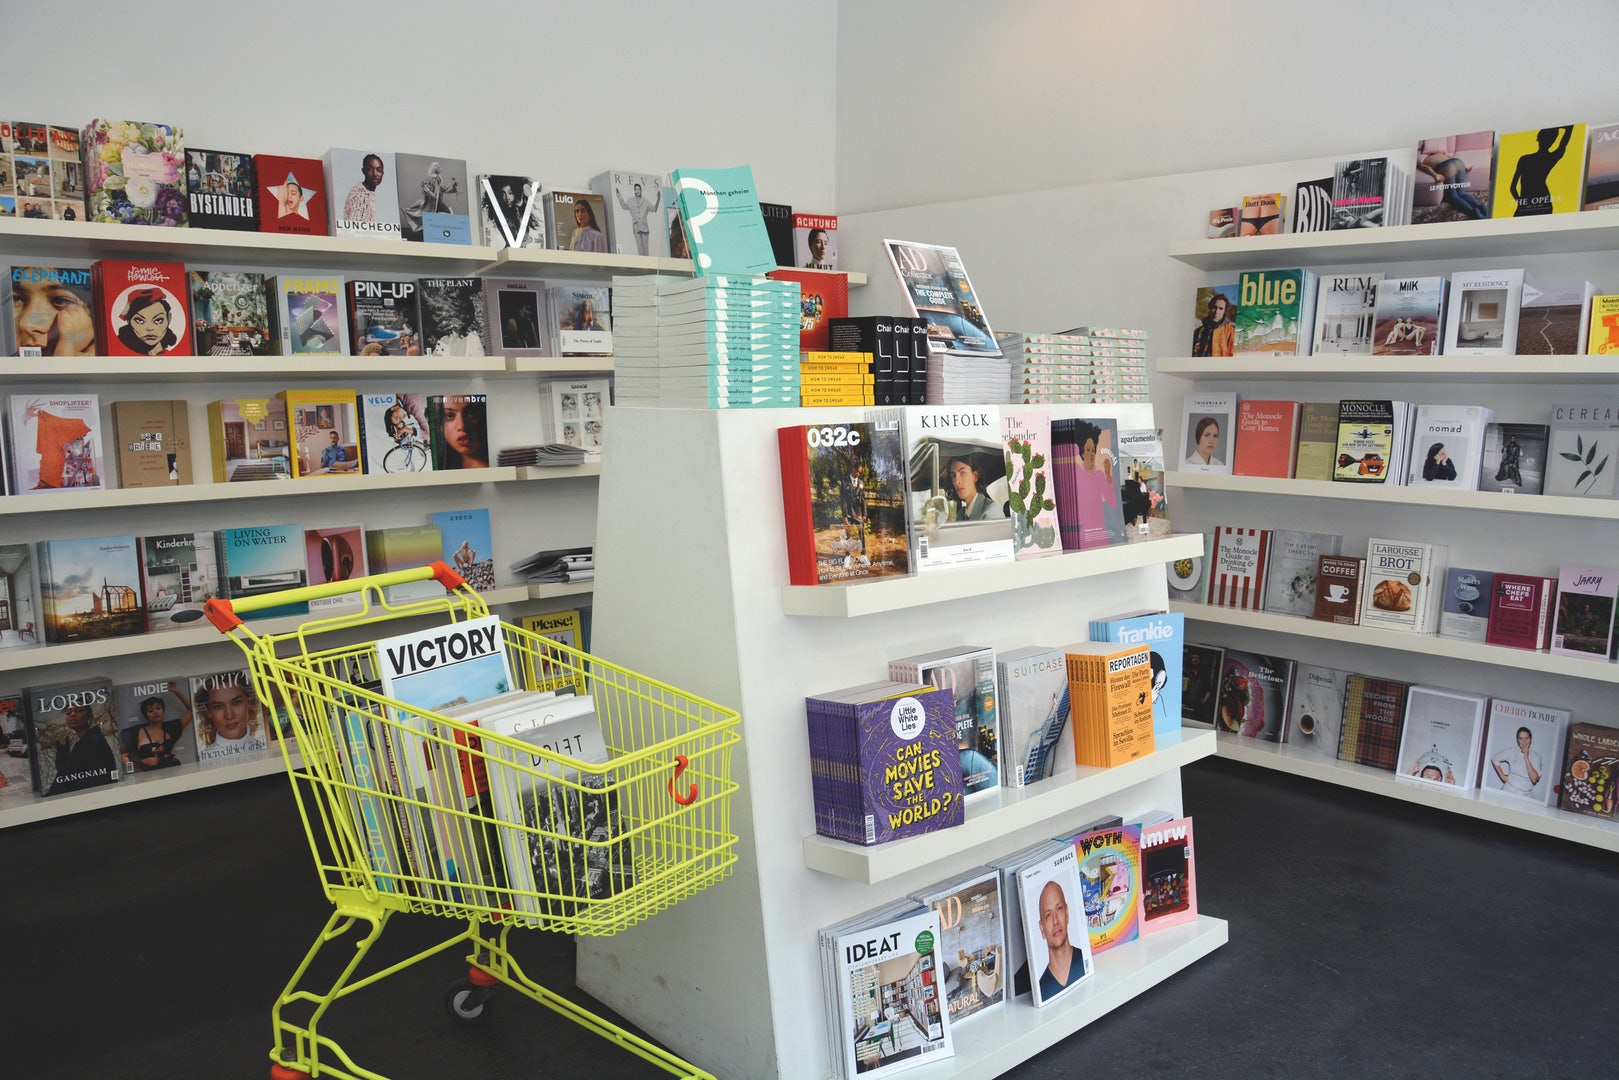 20 wonderful bookshops in Munich   The 2000 Hidden Secrets